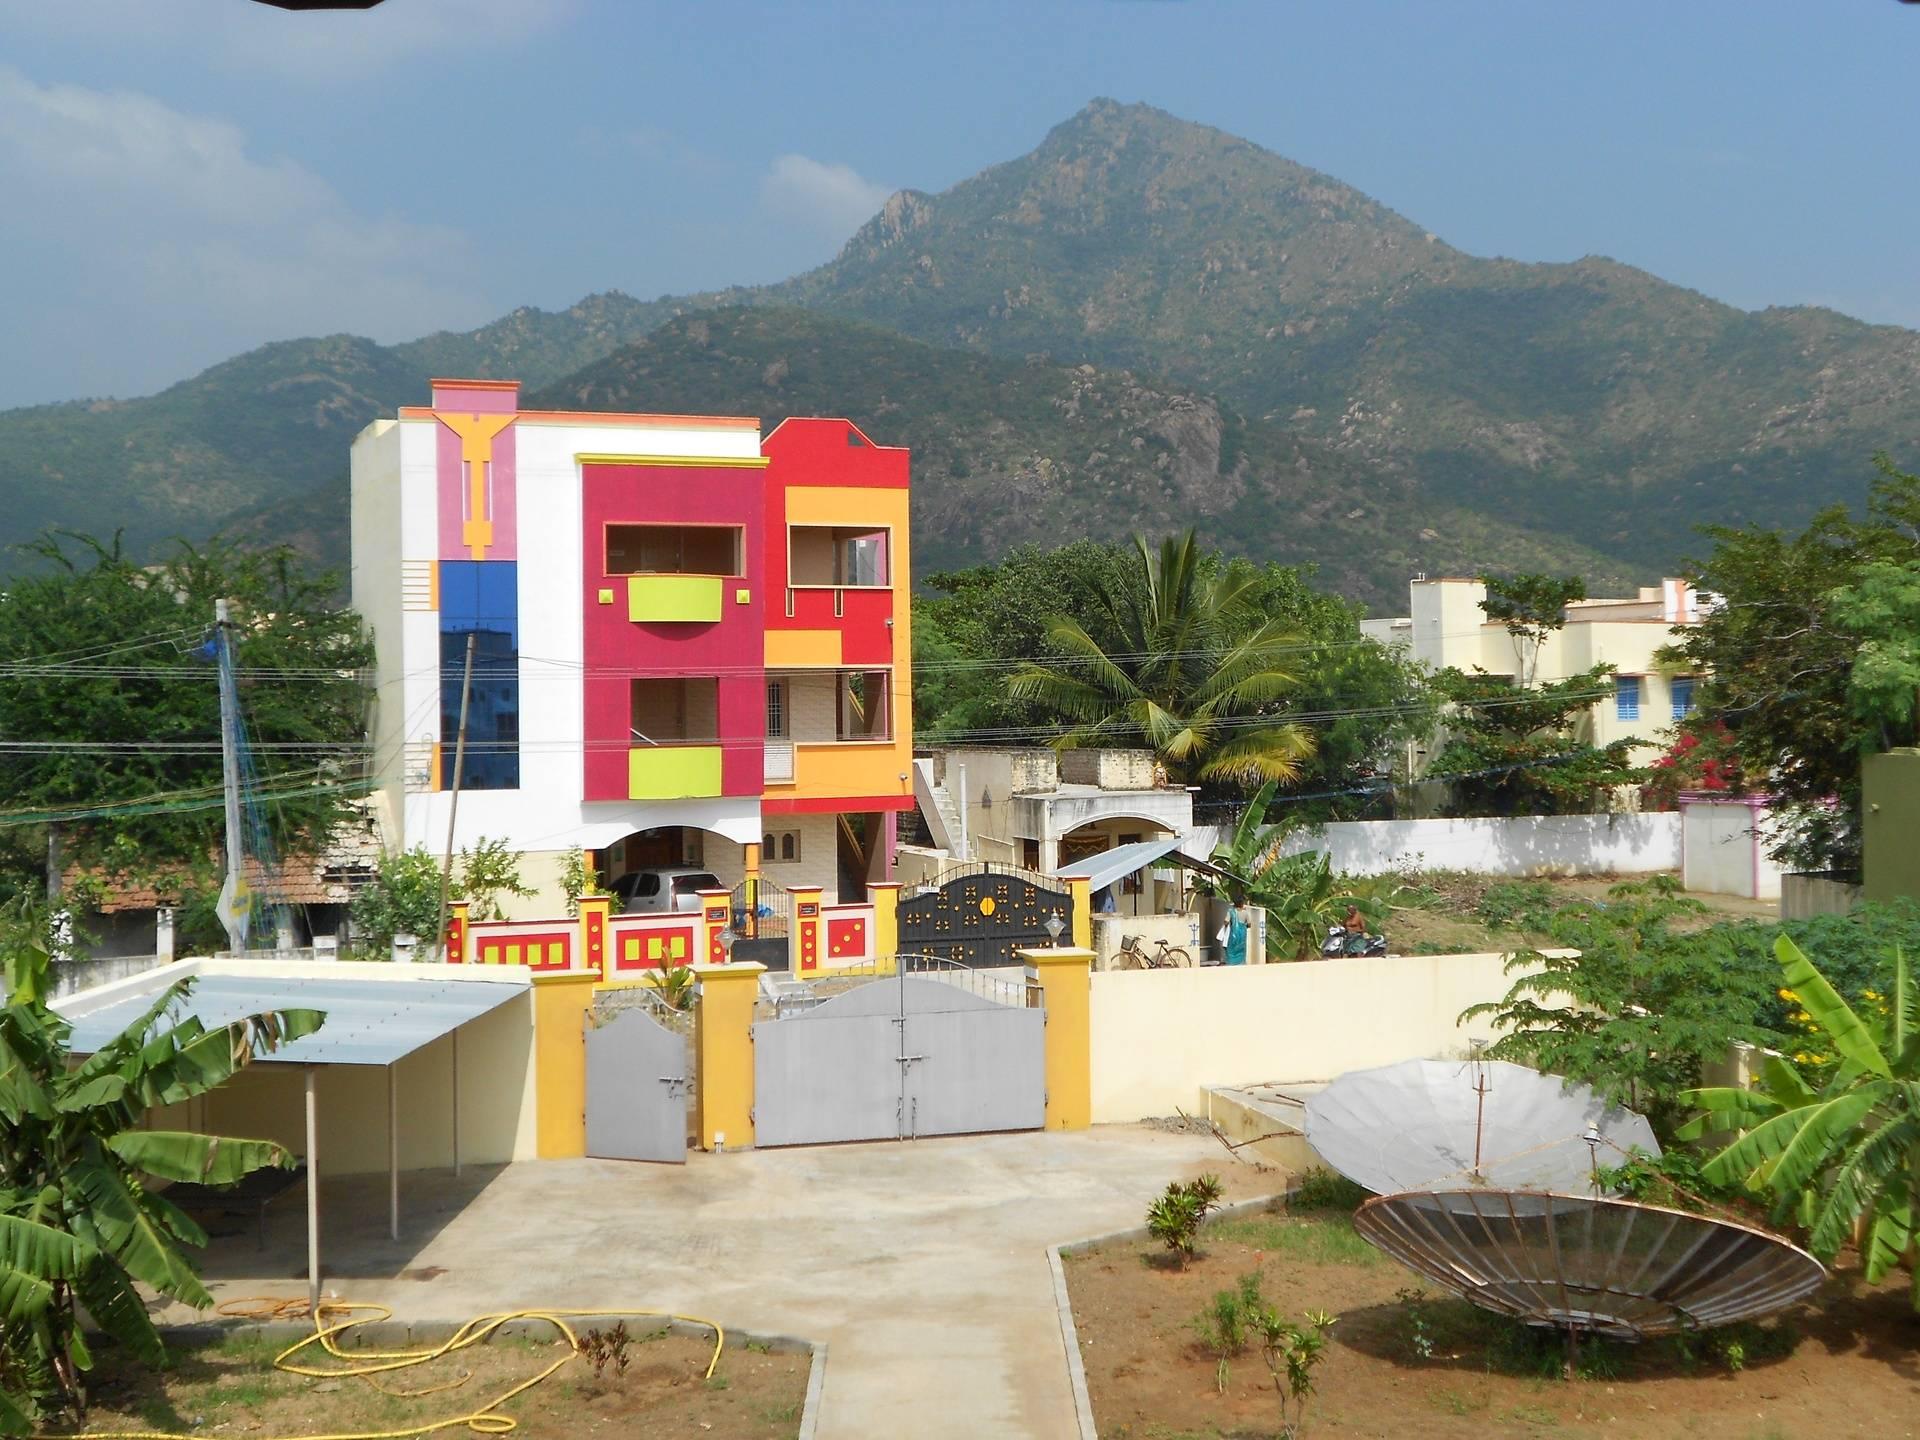 Arunachala from my room in Tiru